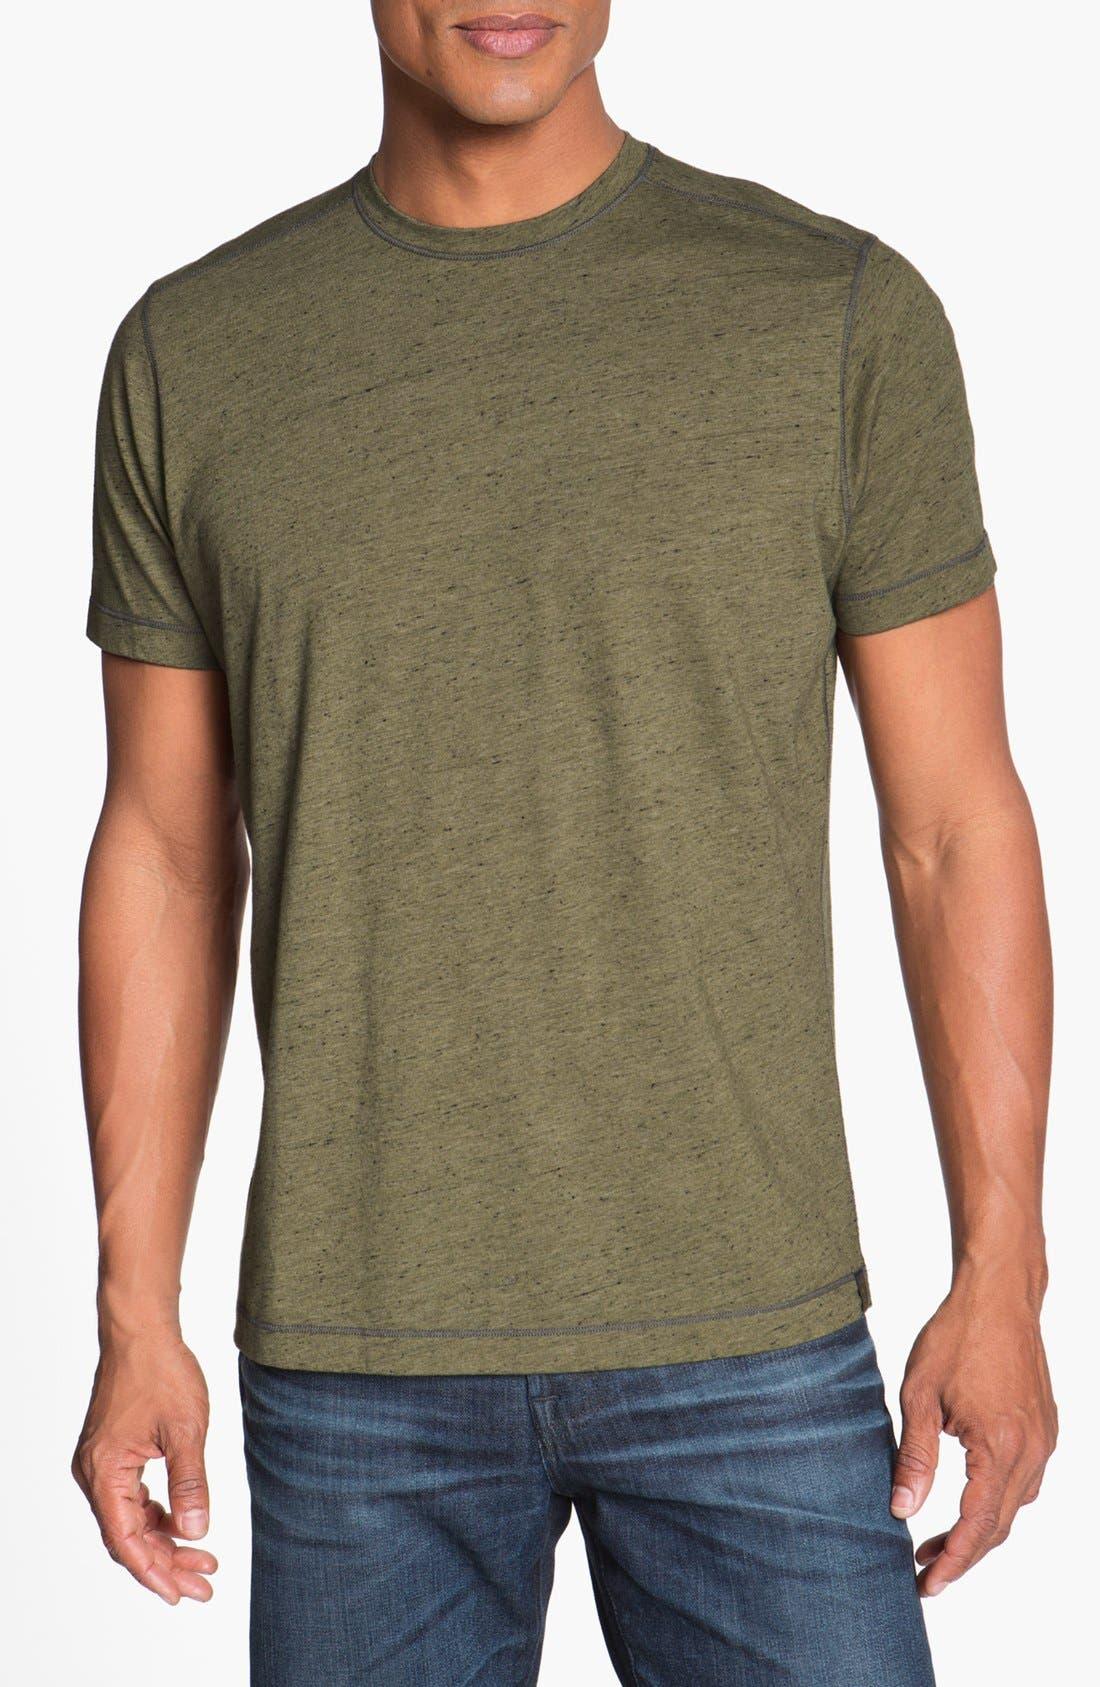 Main Image - Agave Crewneck T-Shirt